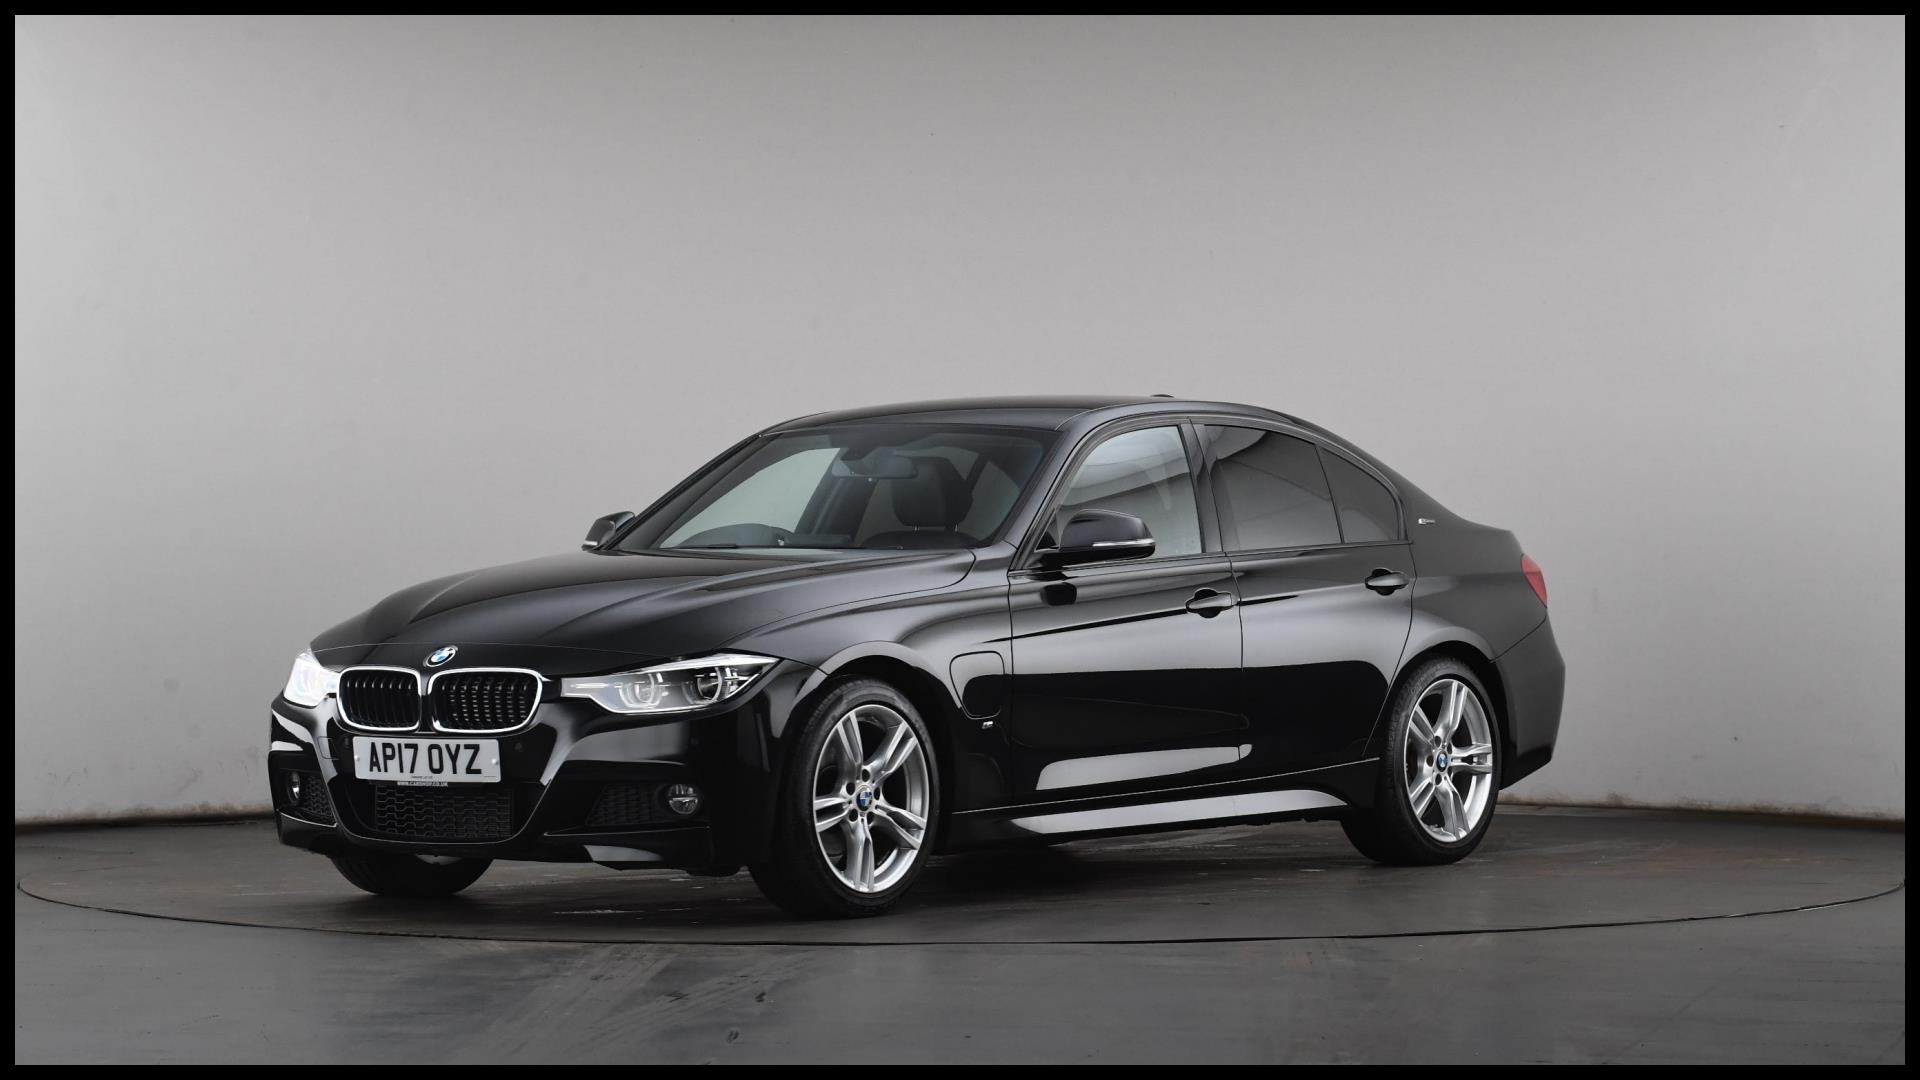 AP17OYZ used BMW 3 SERIES SALOON 330e M Sport 4dr Step Auto PetrolPlugIn Elec Hybrid Automatic BLACK 2017 XC L 10